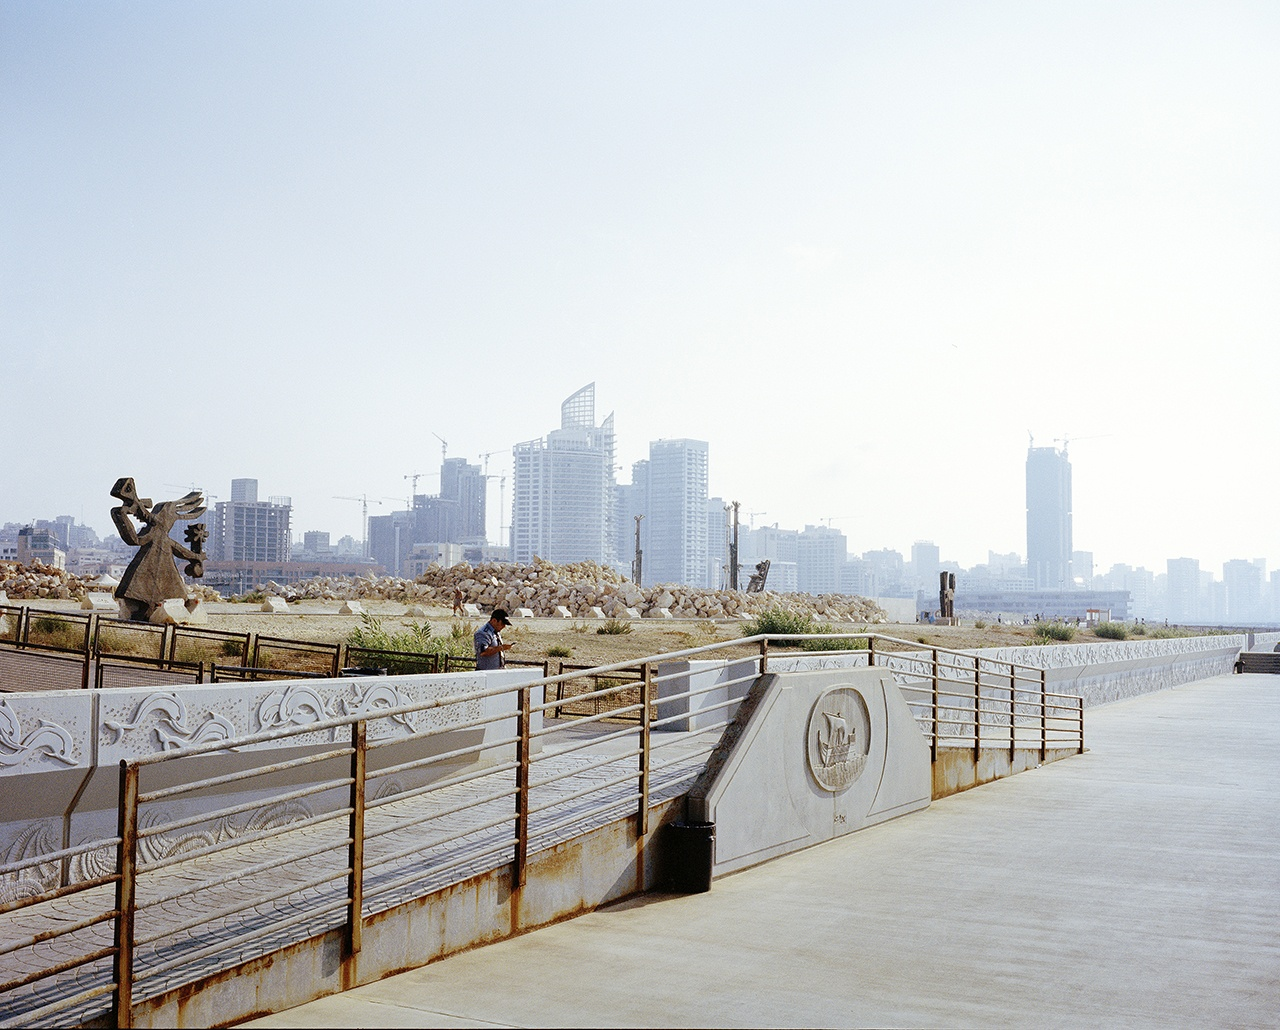 Corniche- Pathway